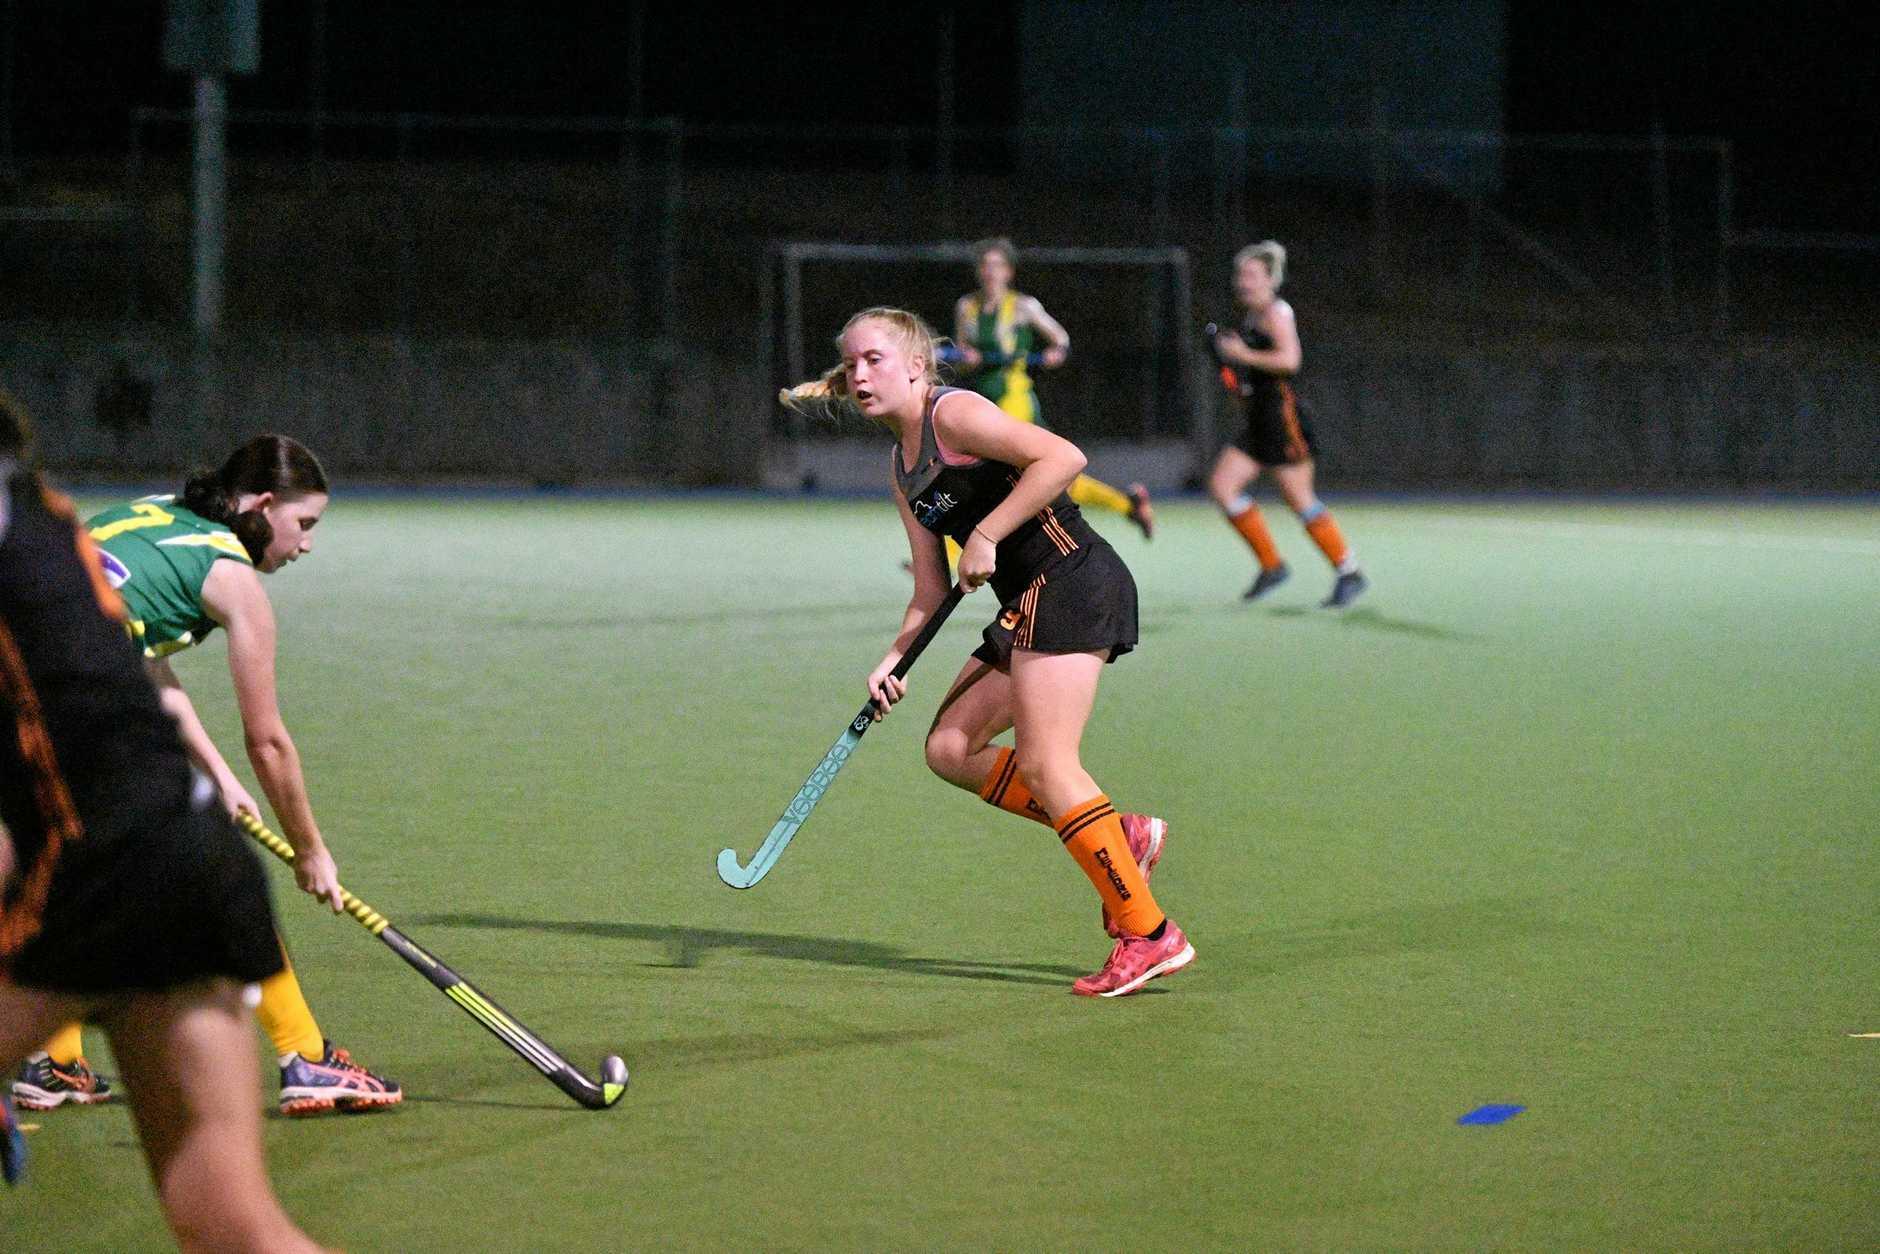 Meteors Anaya McCafferty in the A1 women's hockey grand final